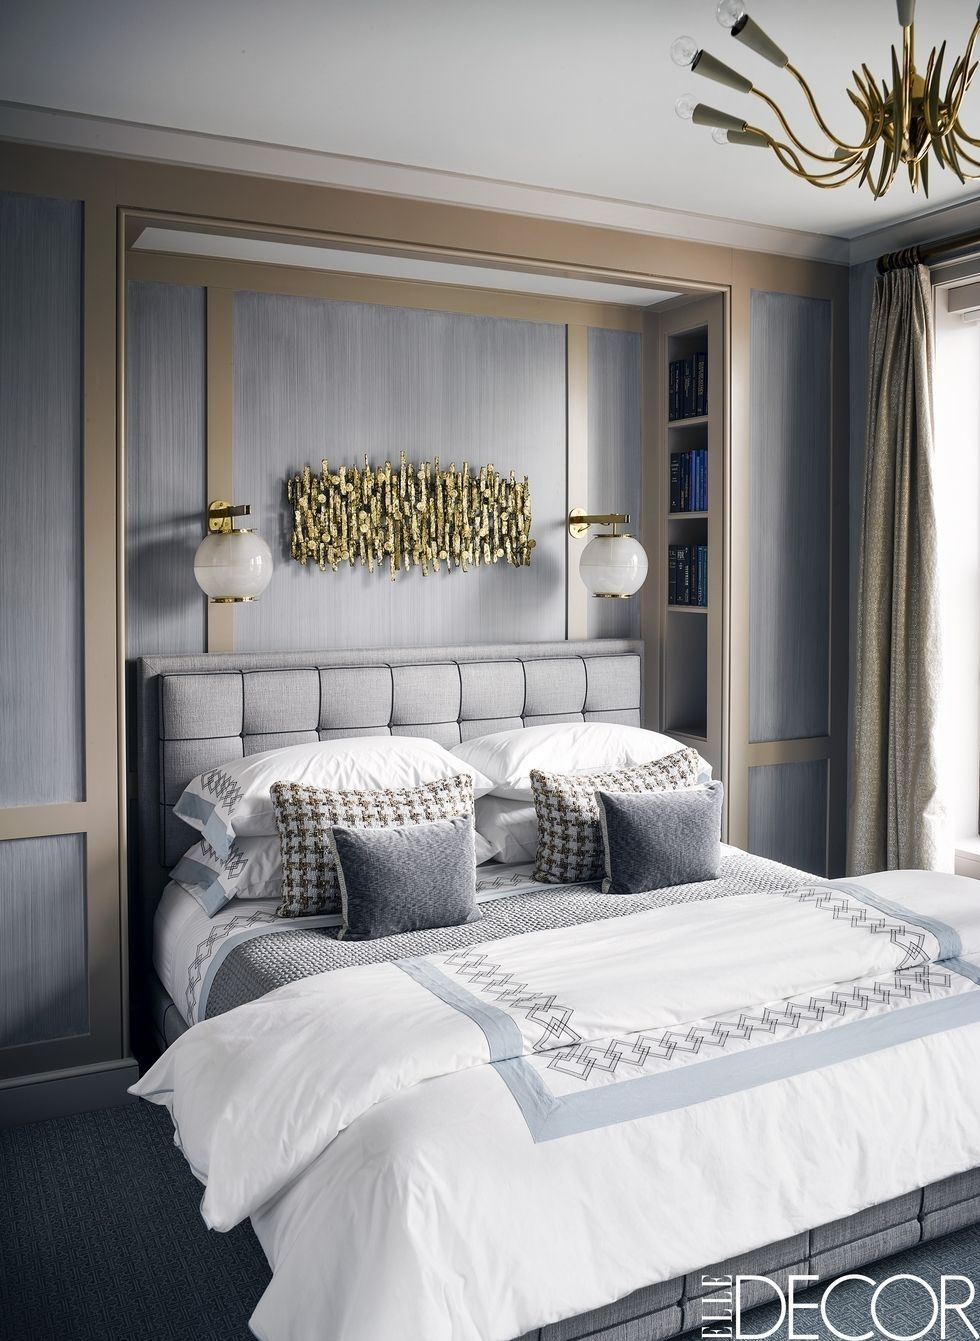 lighting ideas for bedroom bedroom lighting ideas PWLCFTC